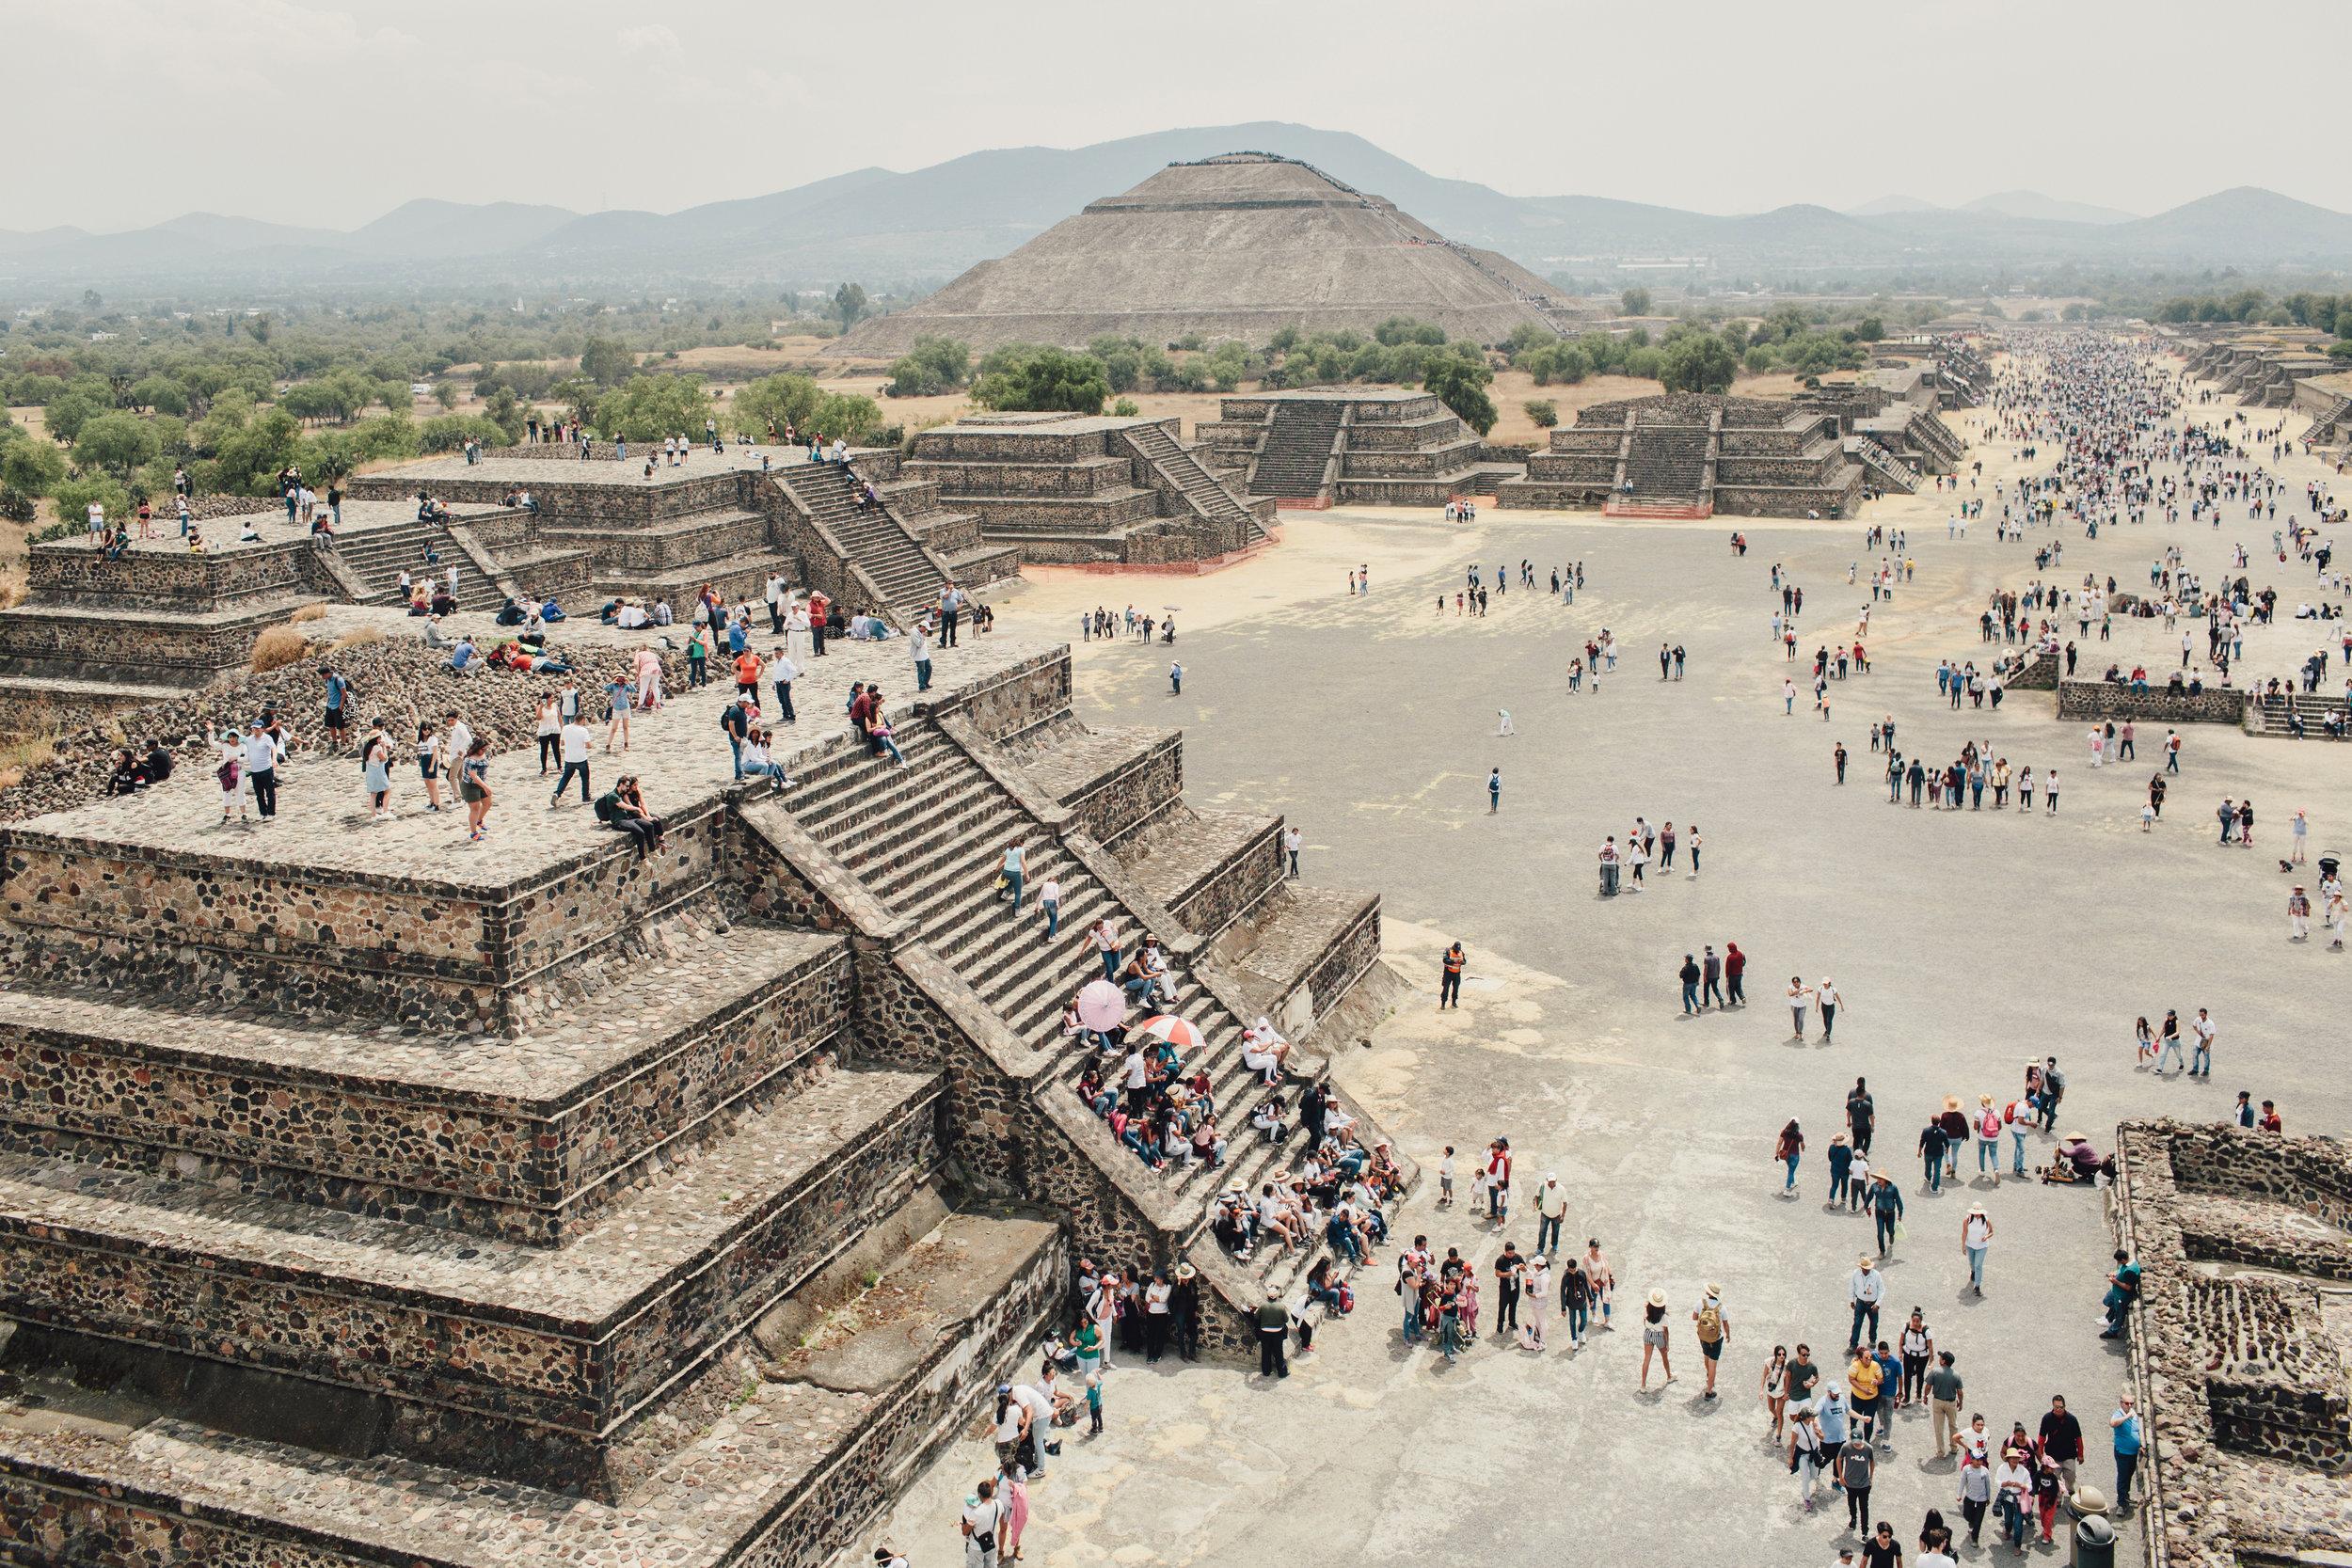 Mexico-City-138 (1).jpg